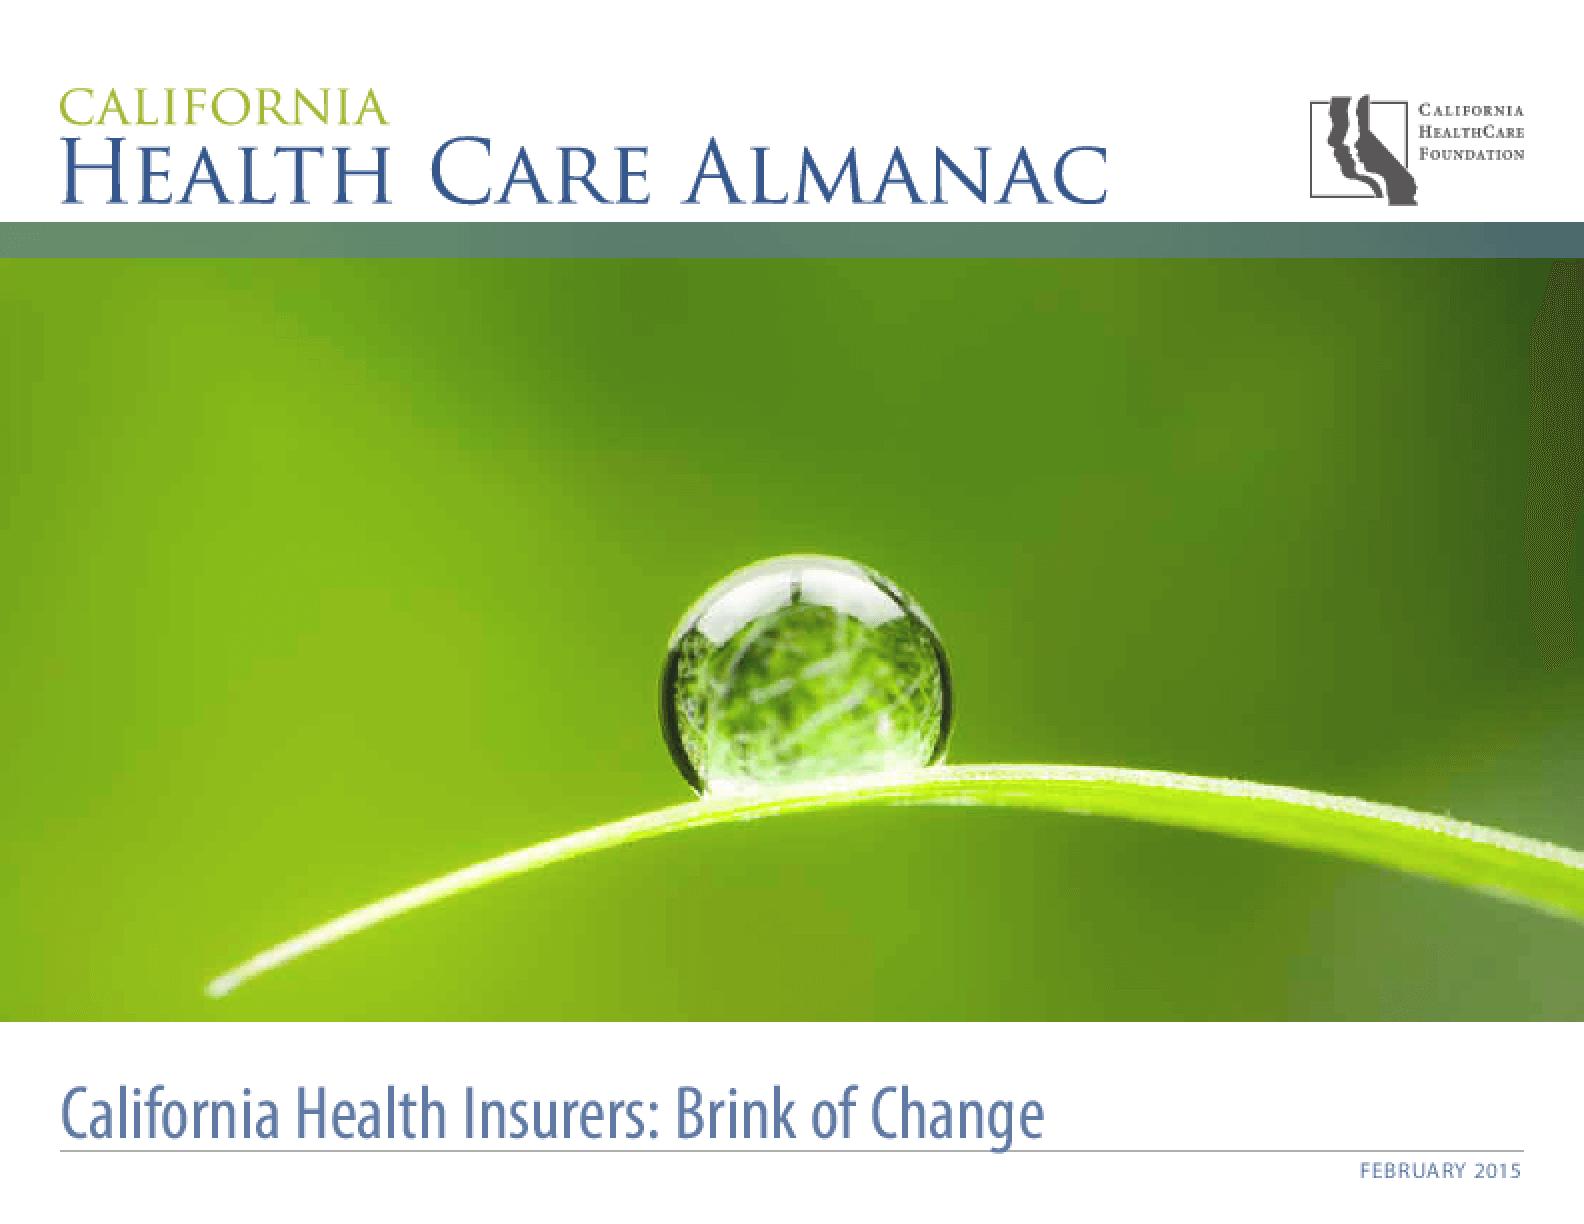 California Health Insurers: Brink of Change